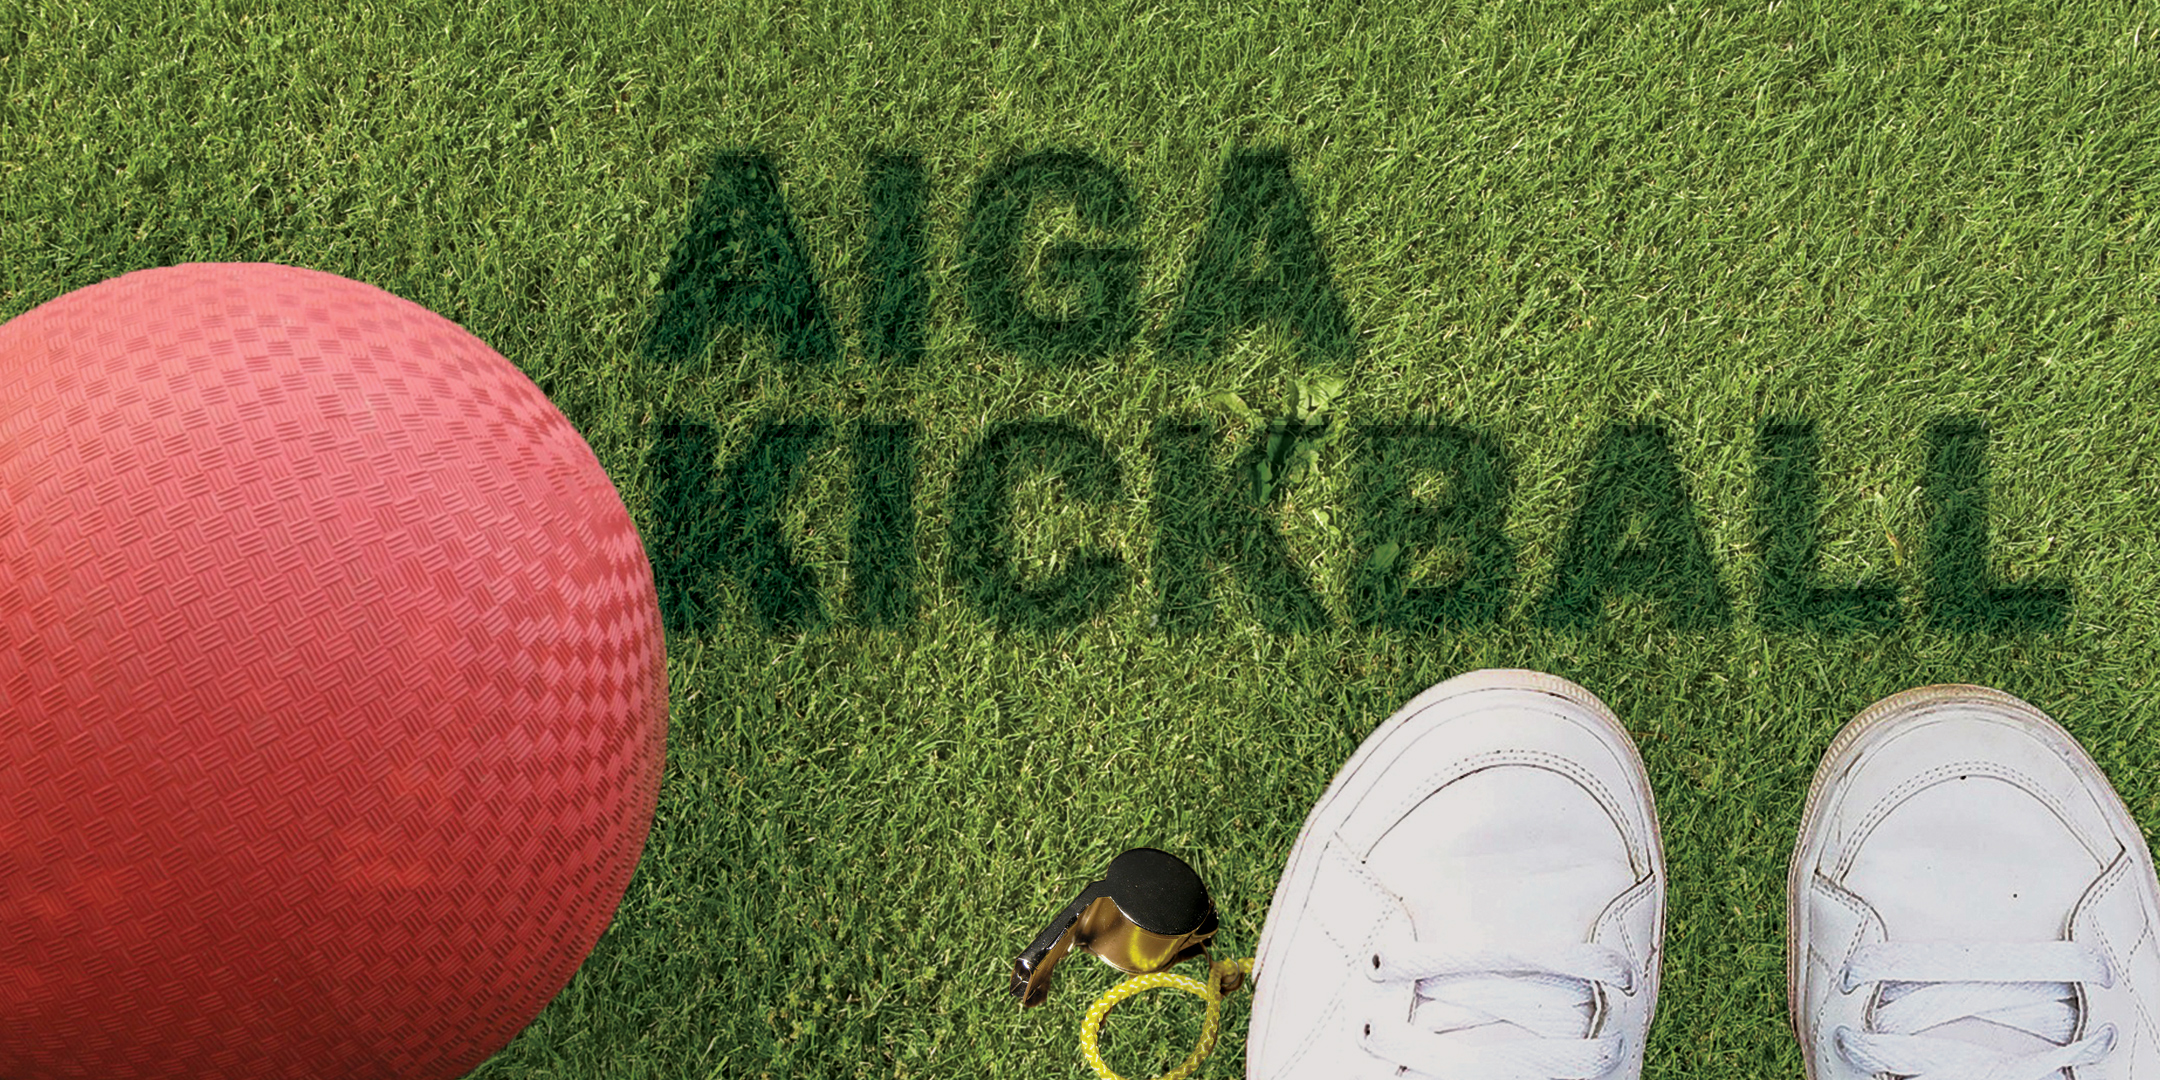 Kickball_image